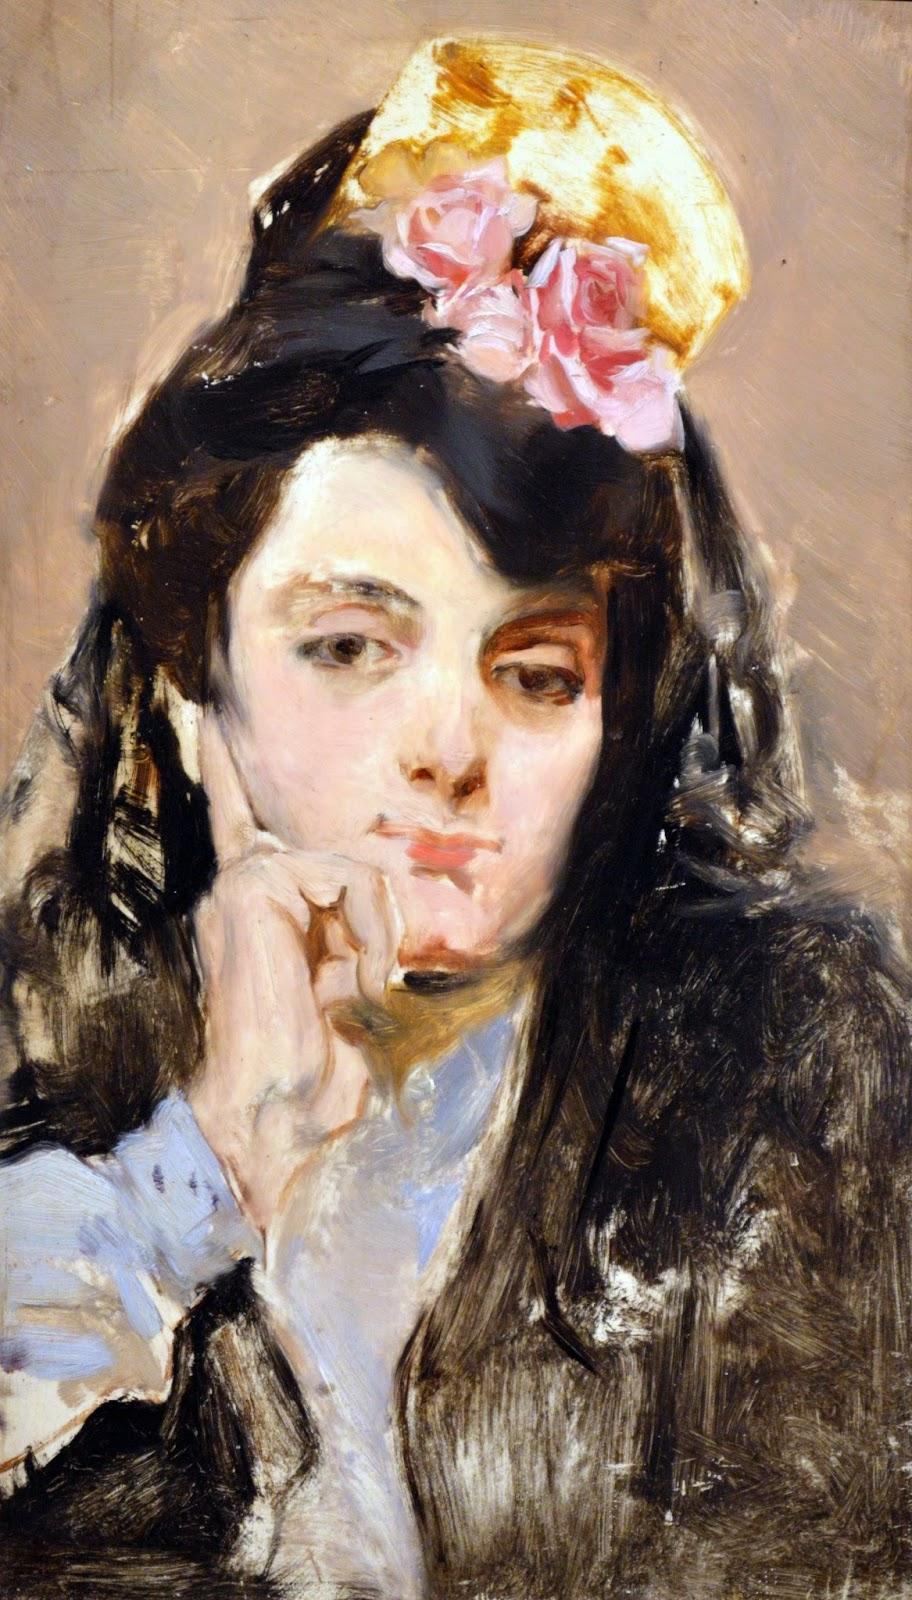 Mujer mantilla negra, Joaquín Sorolla,retratos